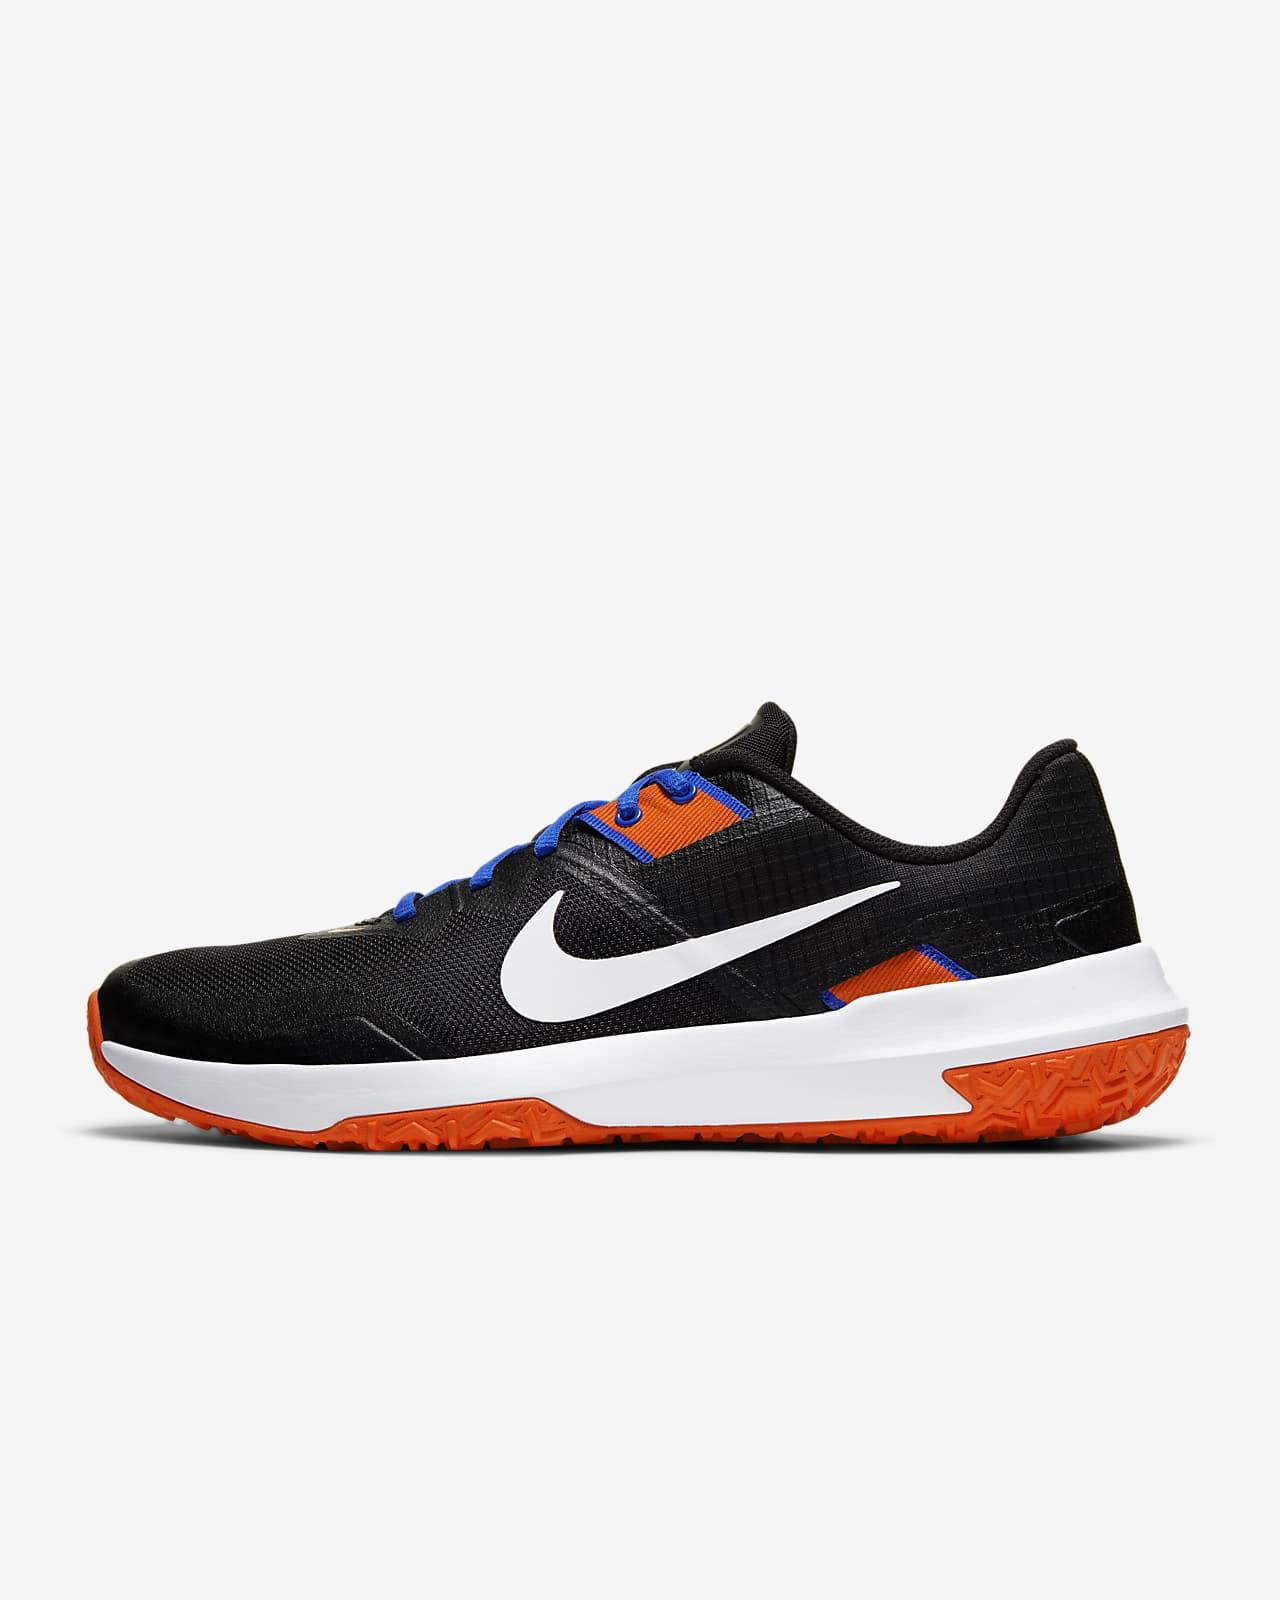 Nike Varsity Compete TR 3 Herren-Trainingsschuh